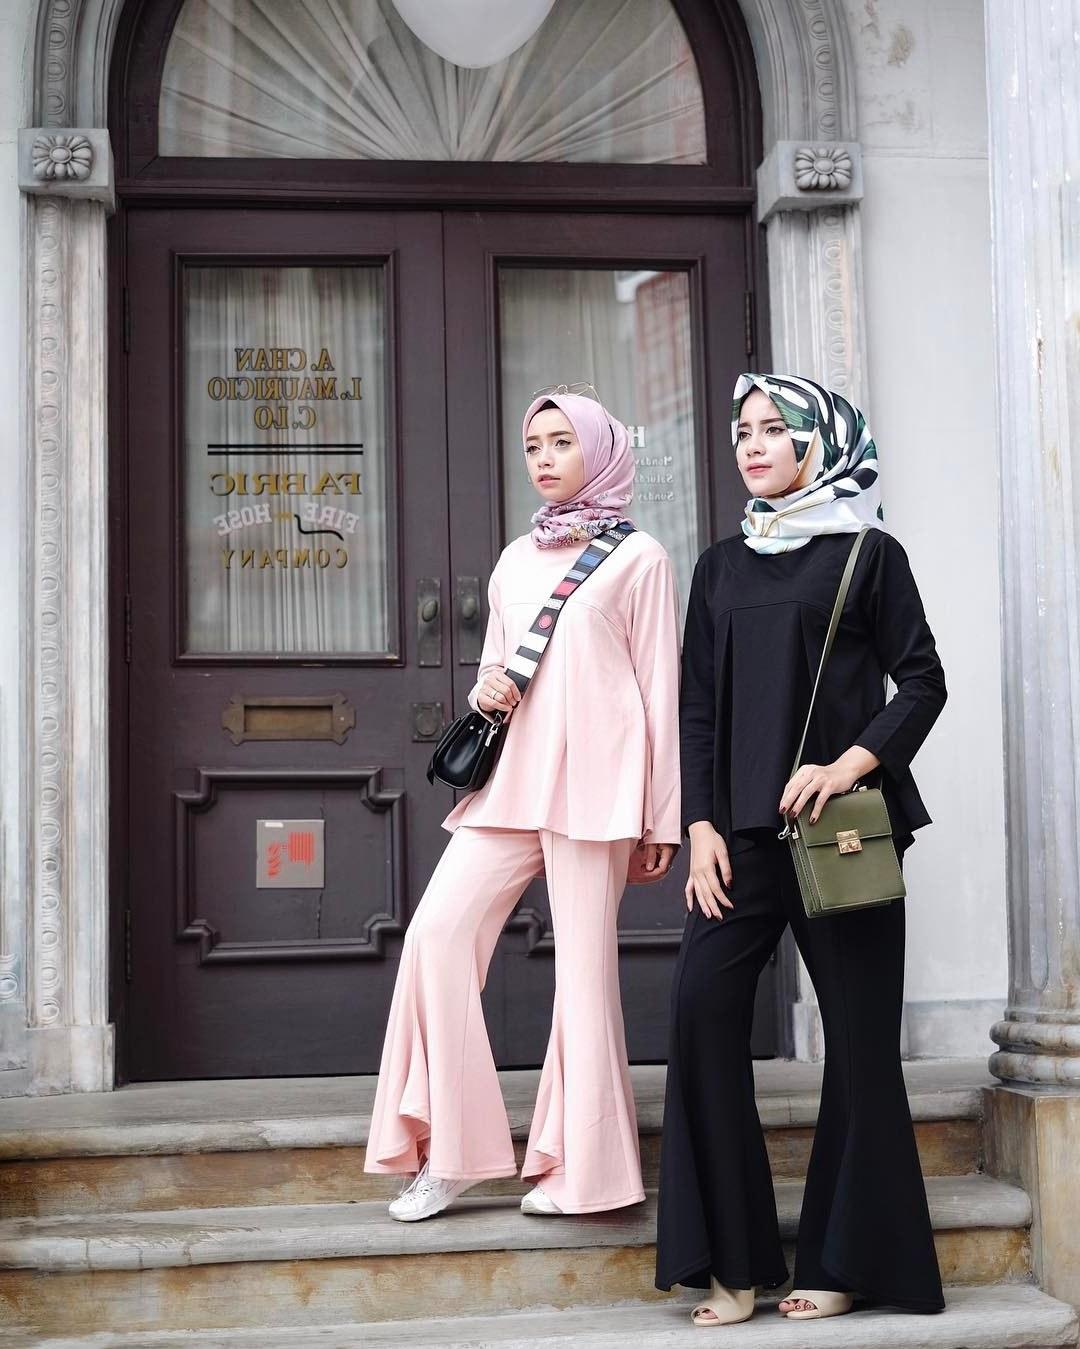 Ide Ootd Baju Lebaran Thdr 25 Model Baju Lebaran Terbaru Untuk Idul Fitri 2018